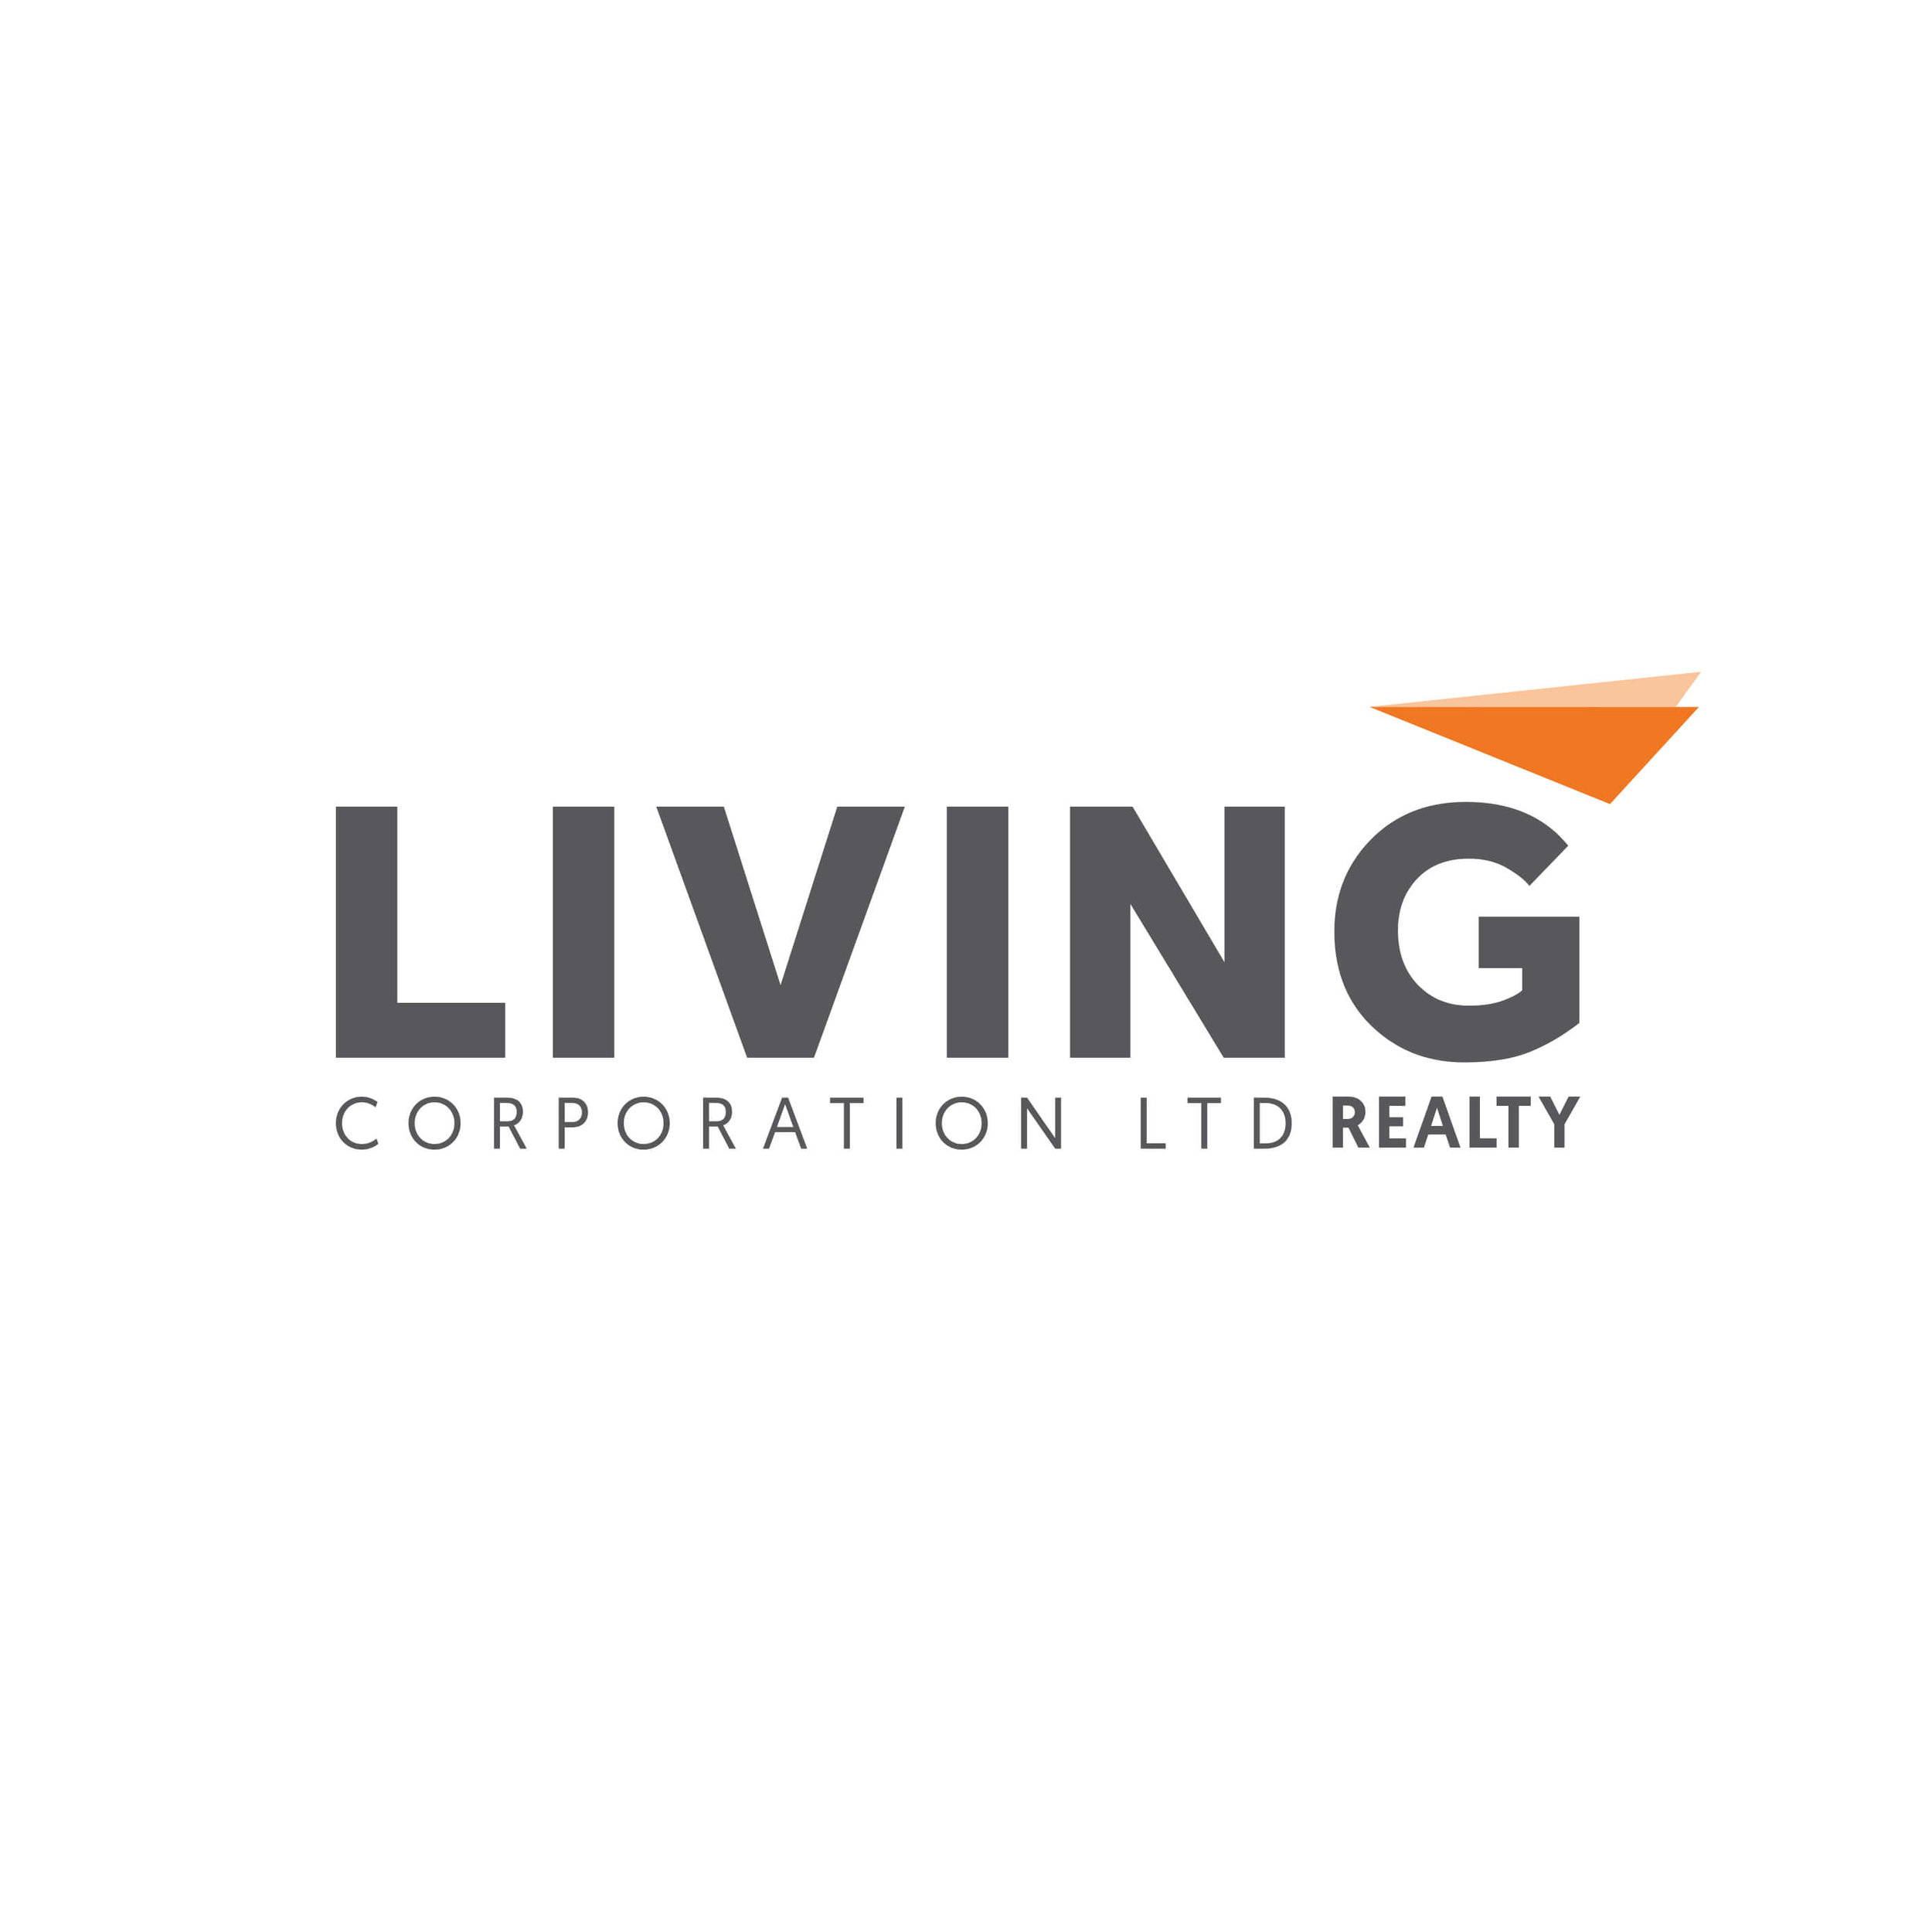 Living Corp logo.jpg